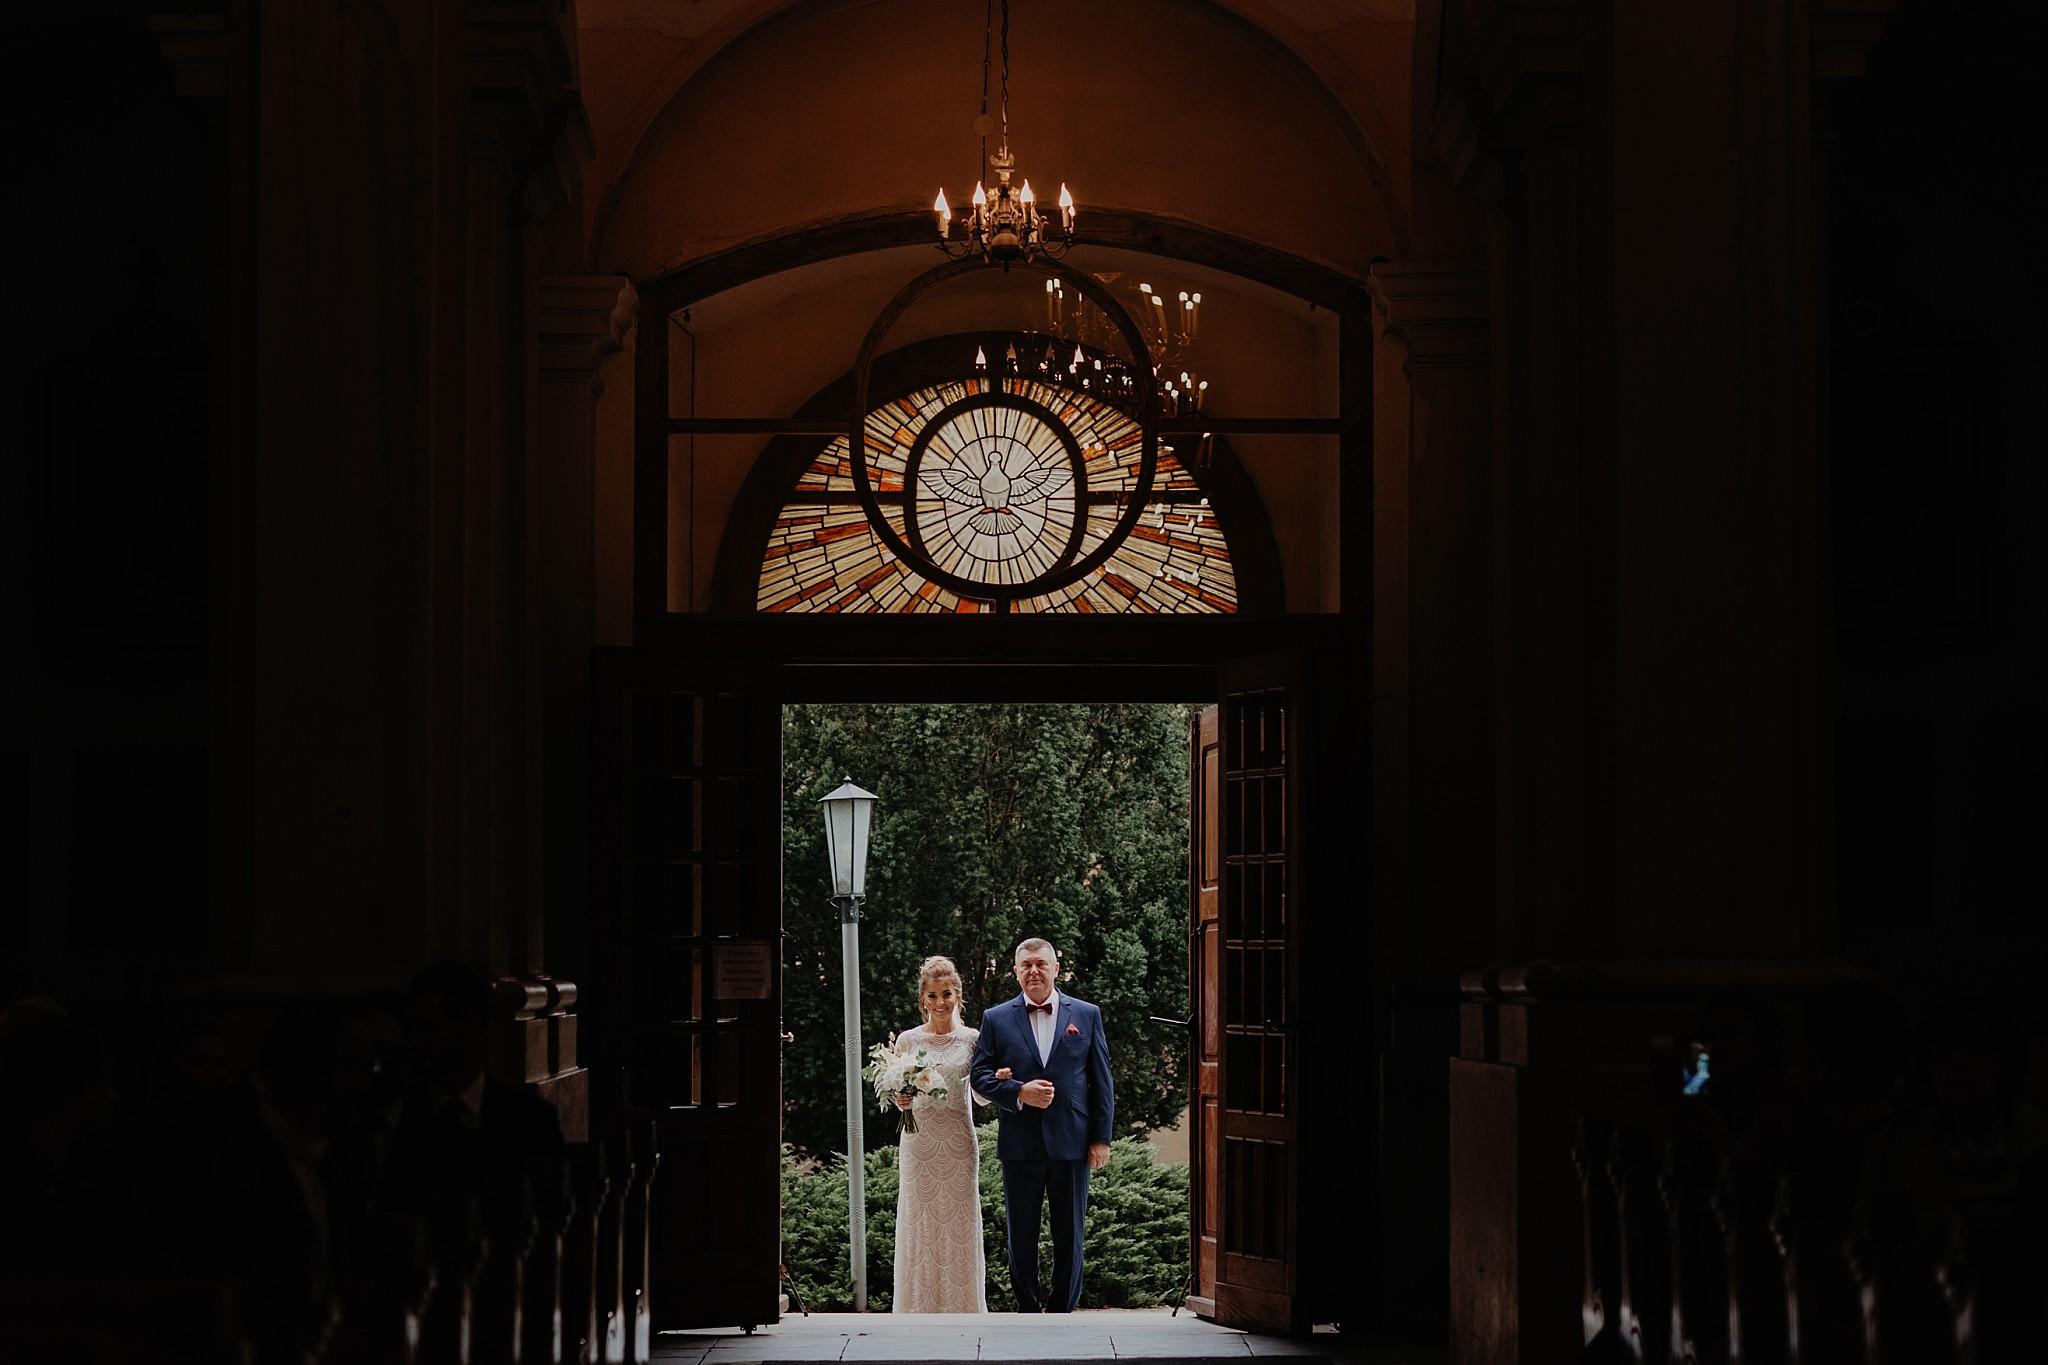 fotograf poznan wesele dobra truskawka piekne wesele pod poznaniem wesele w dobrej truskawce piekna para mloda slub marzen slub koronawirus slub listopad wesele koronawirus 144